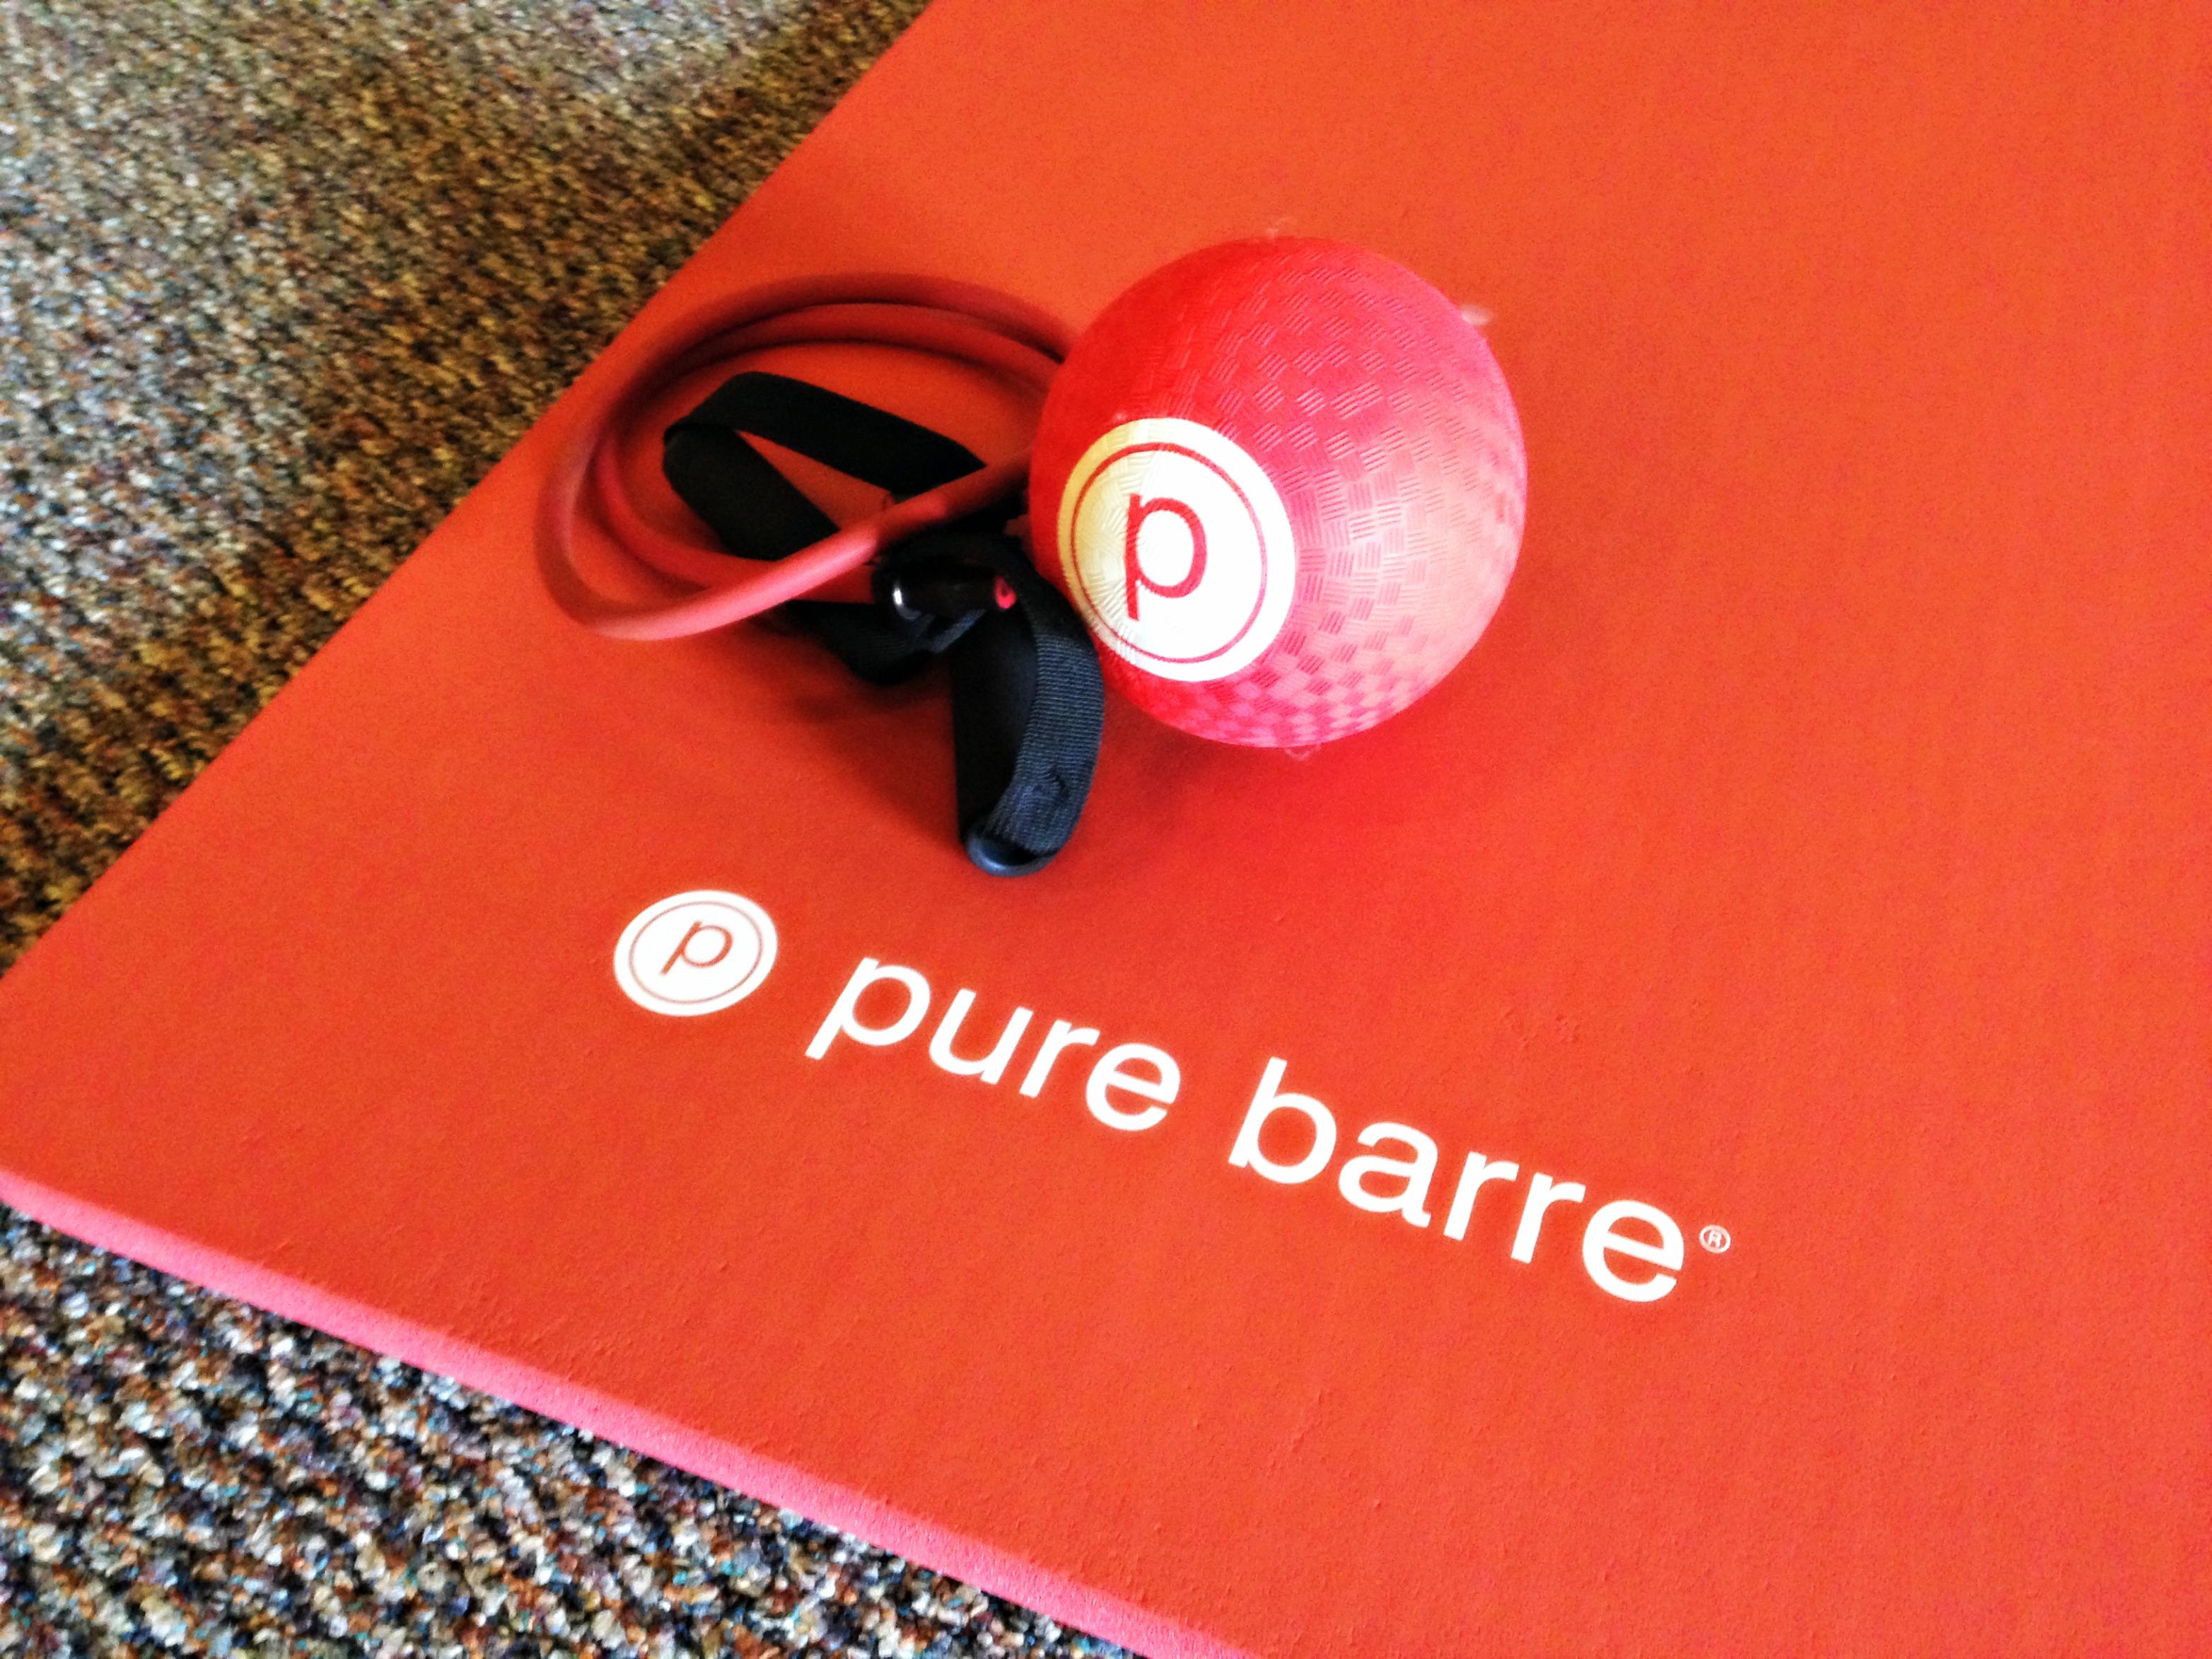 Pure Barre equipment